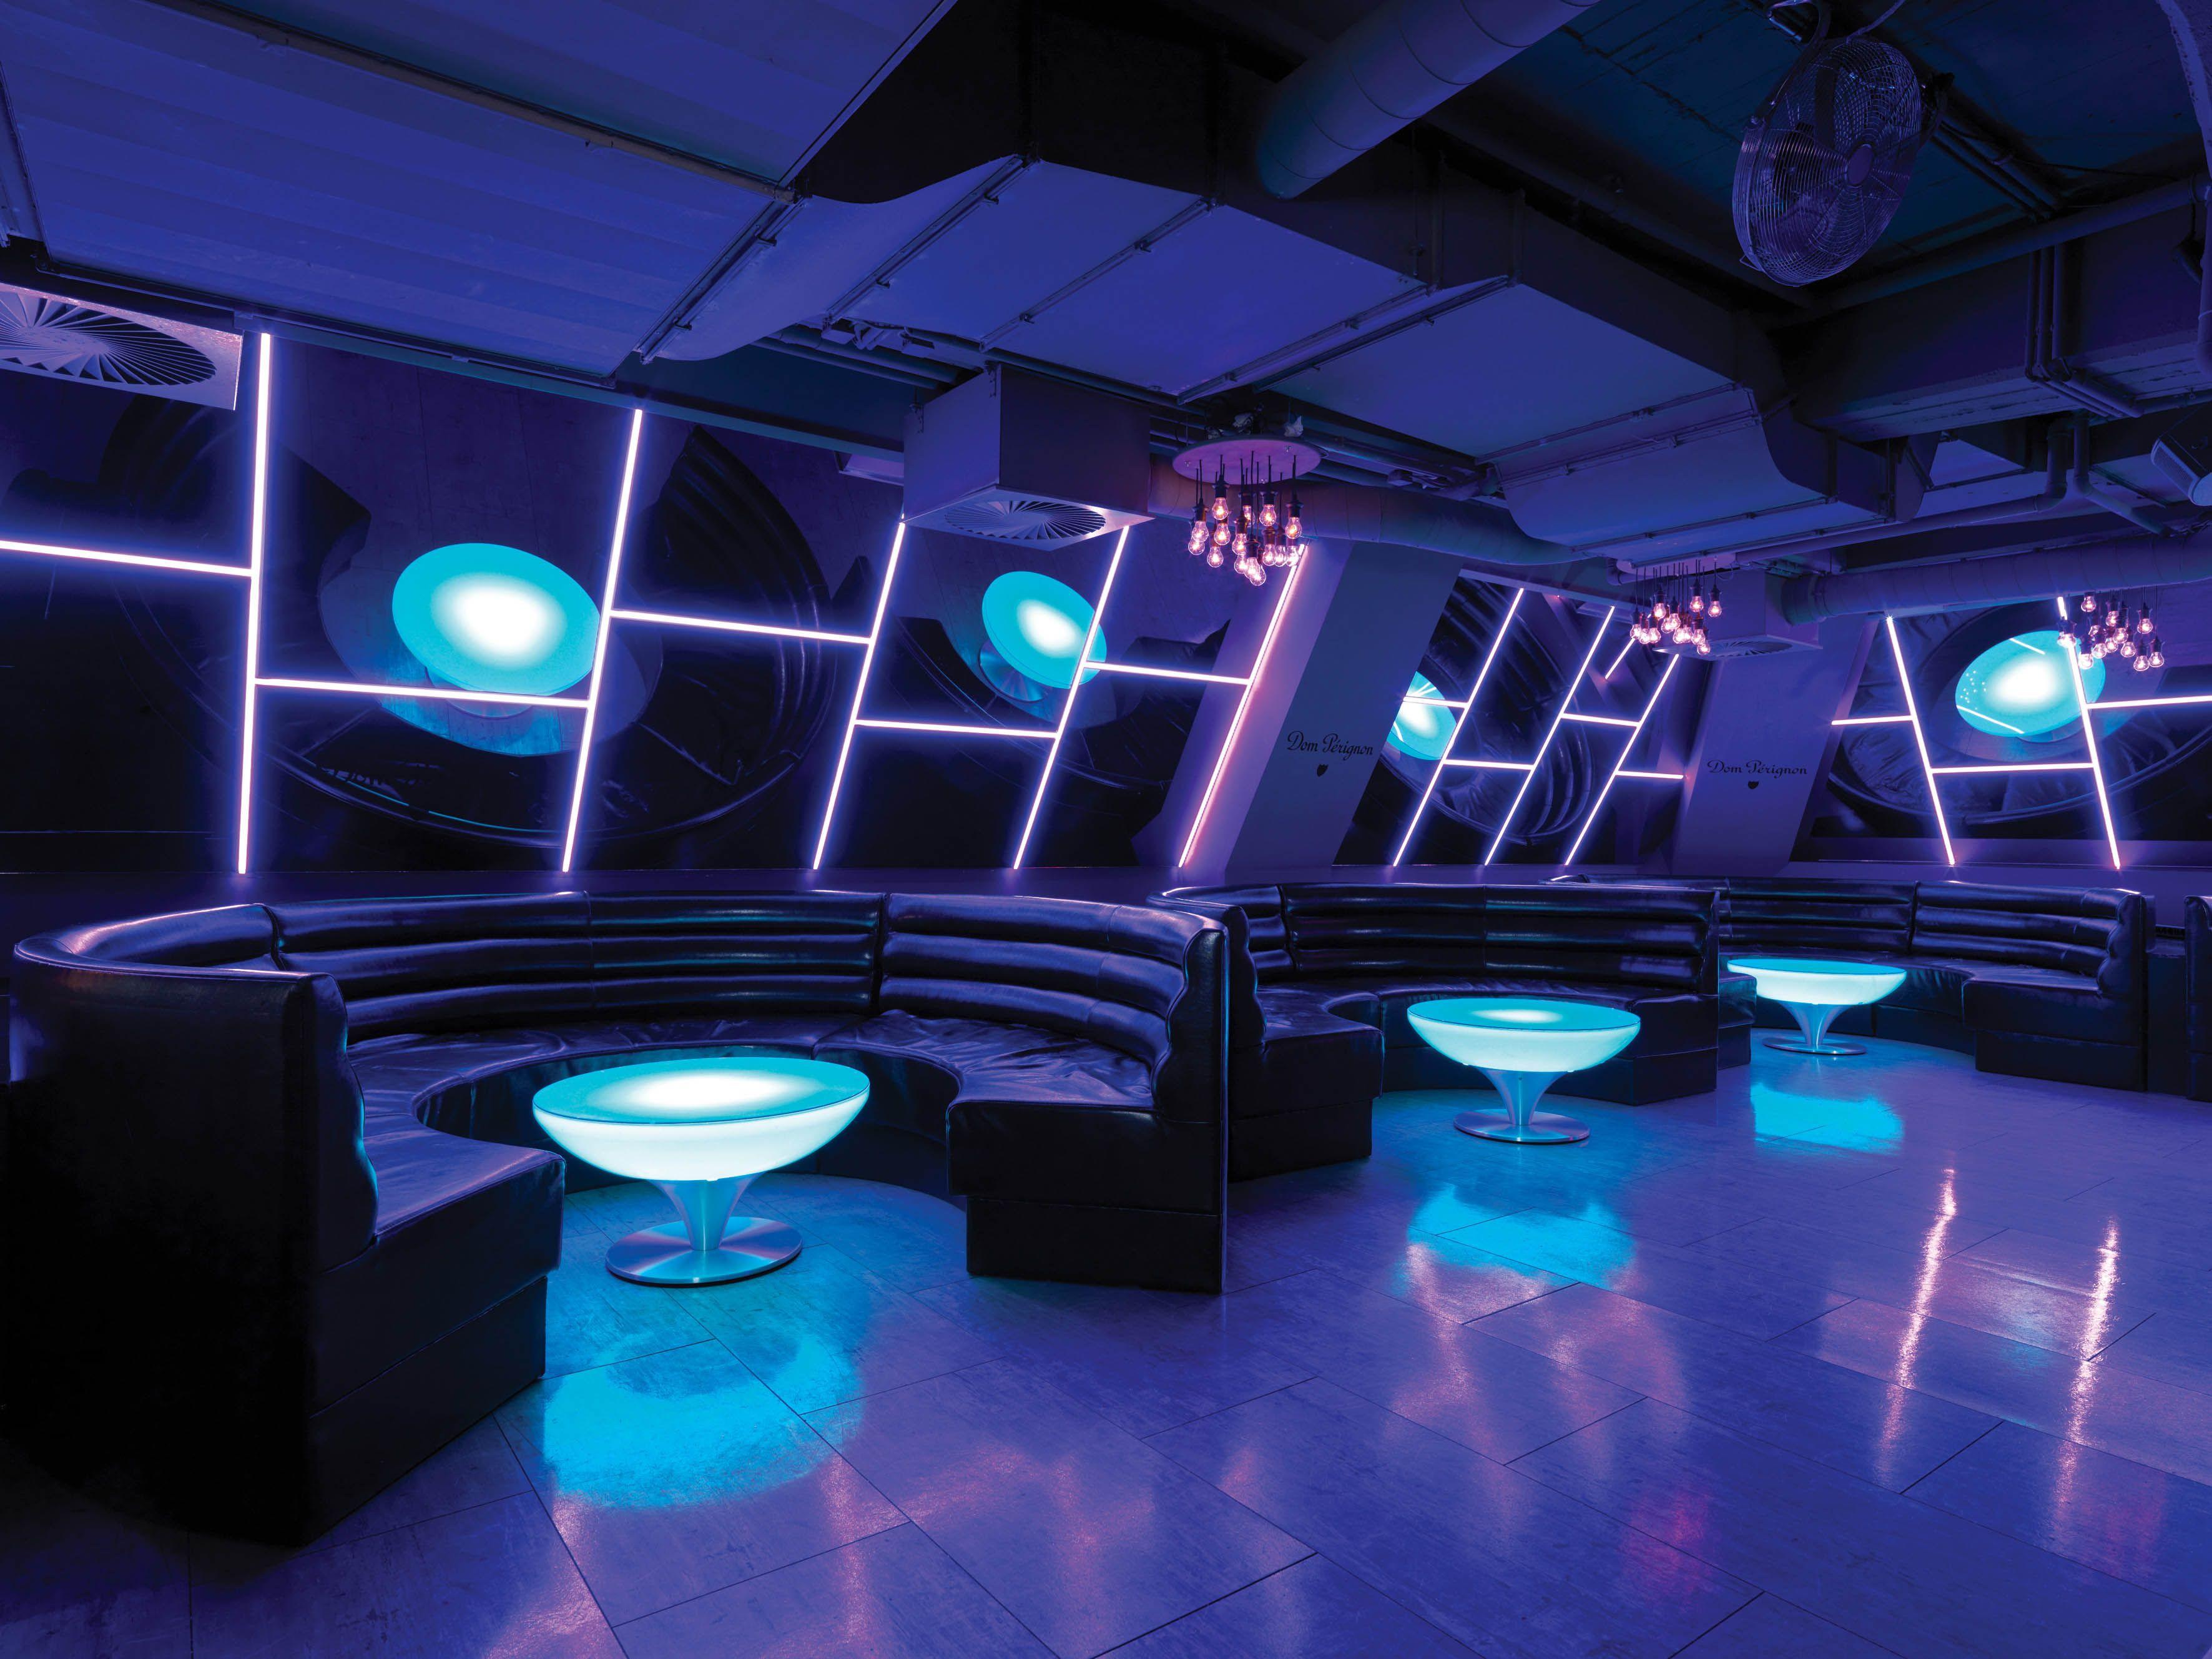 07 09 04 Lounge 45 Led Pro Accu Blue X3 Reduced Size Jpg 3543 2657 Hookah Lounge Decor Nightclub Design Lounge Design